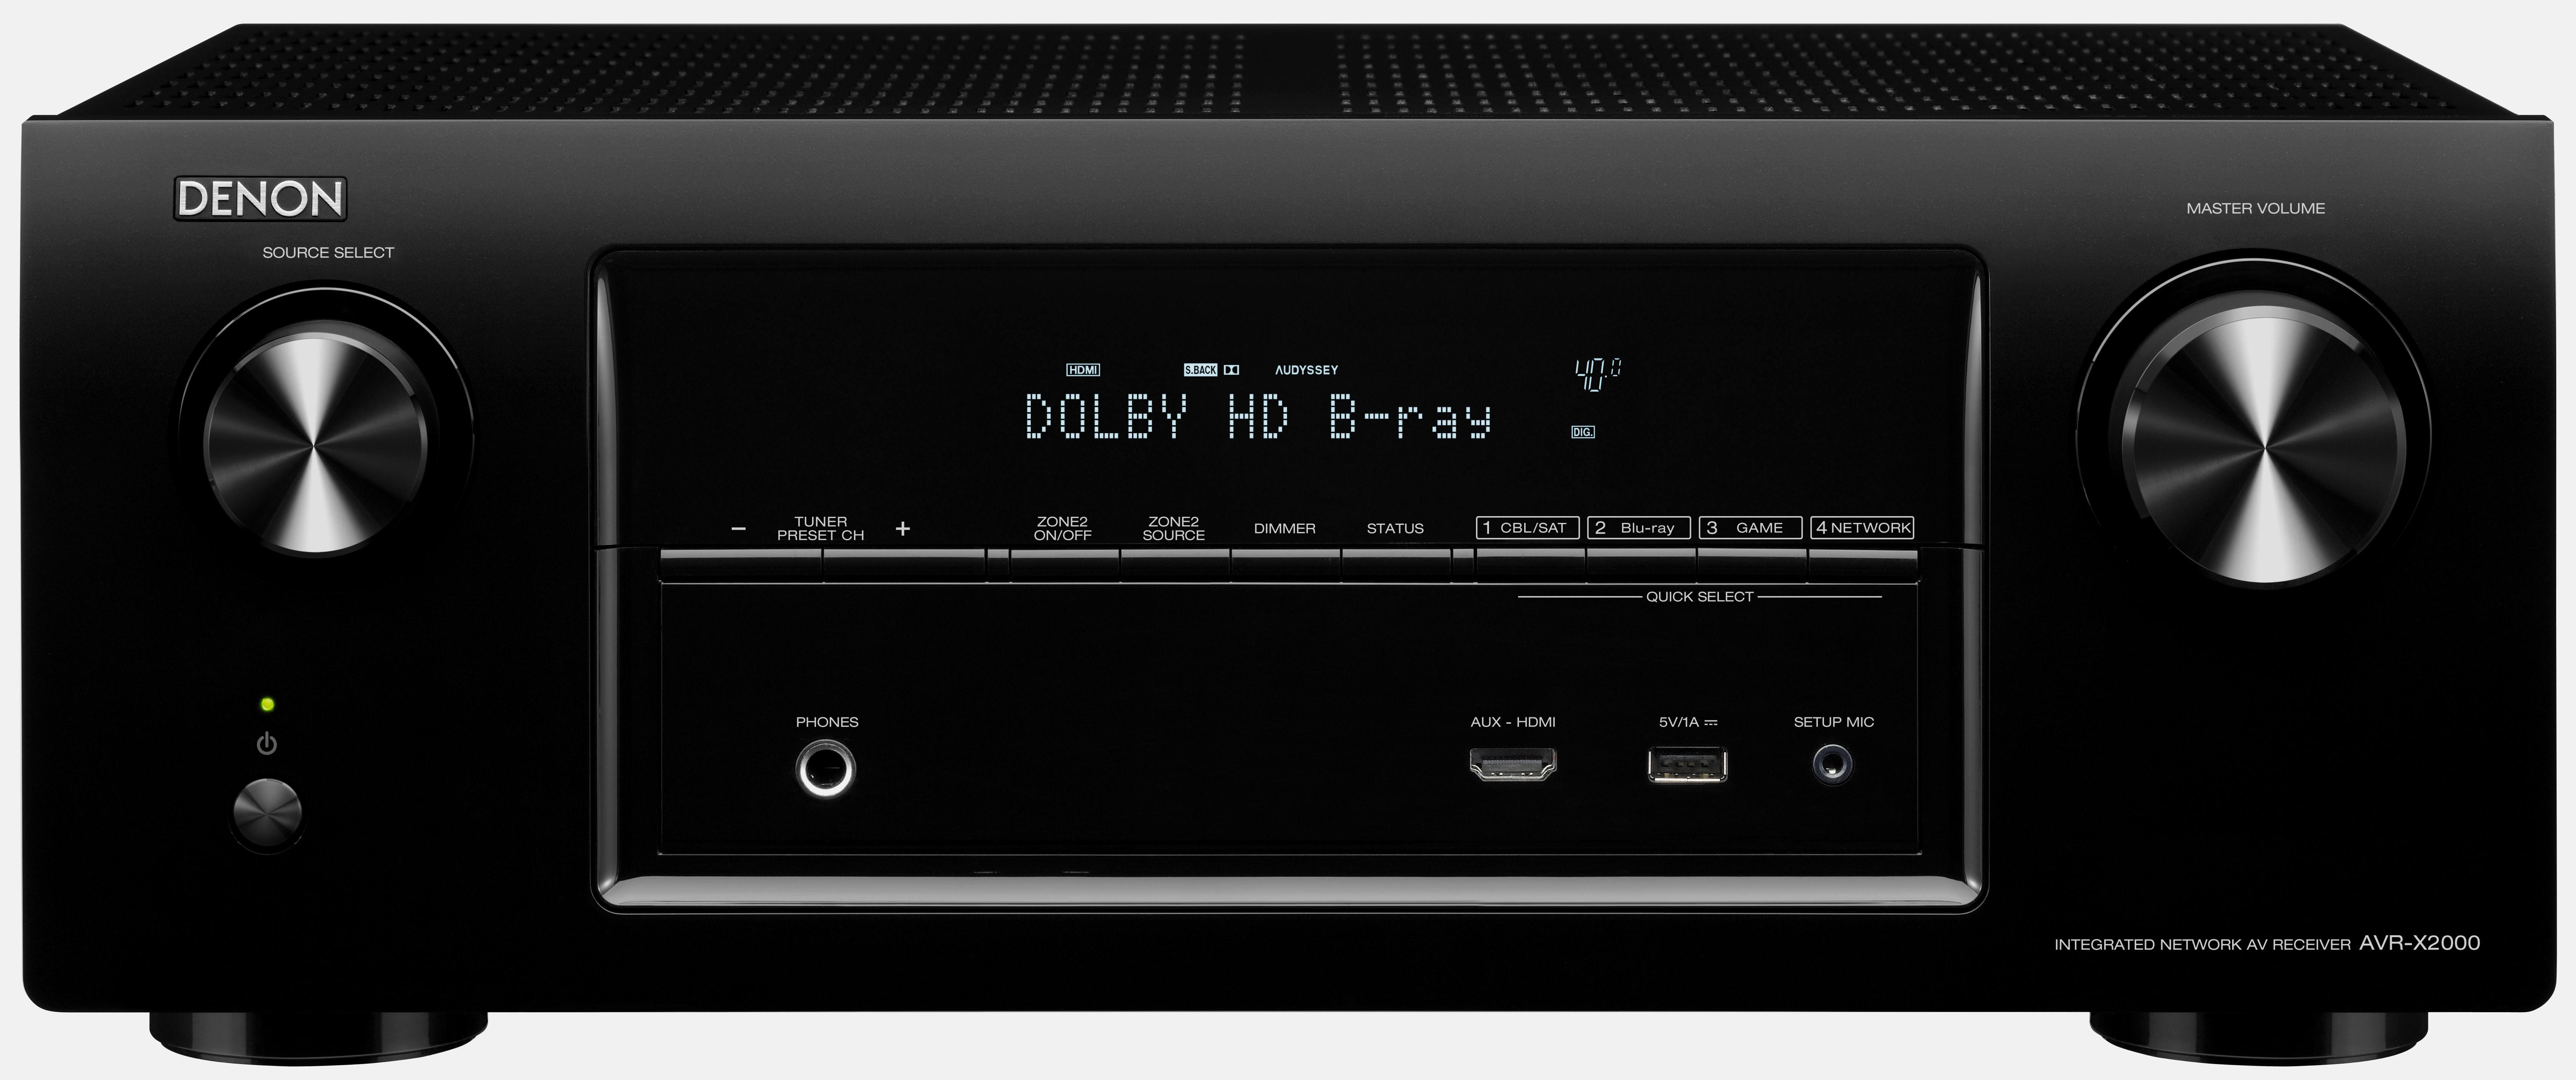 Denon AVR-X2000 7.1-Channel 4K Ultra HD AV Receiver